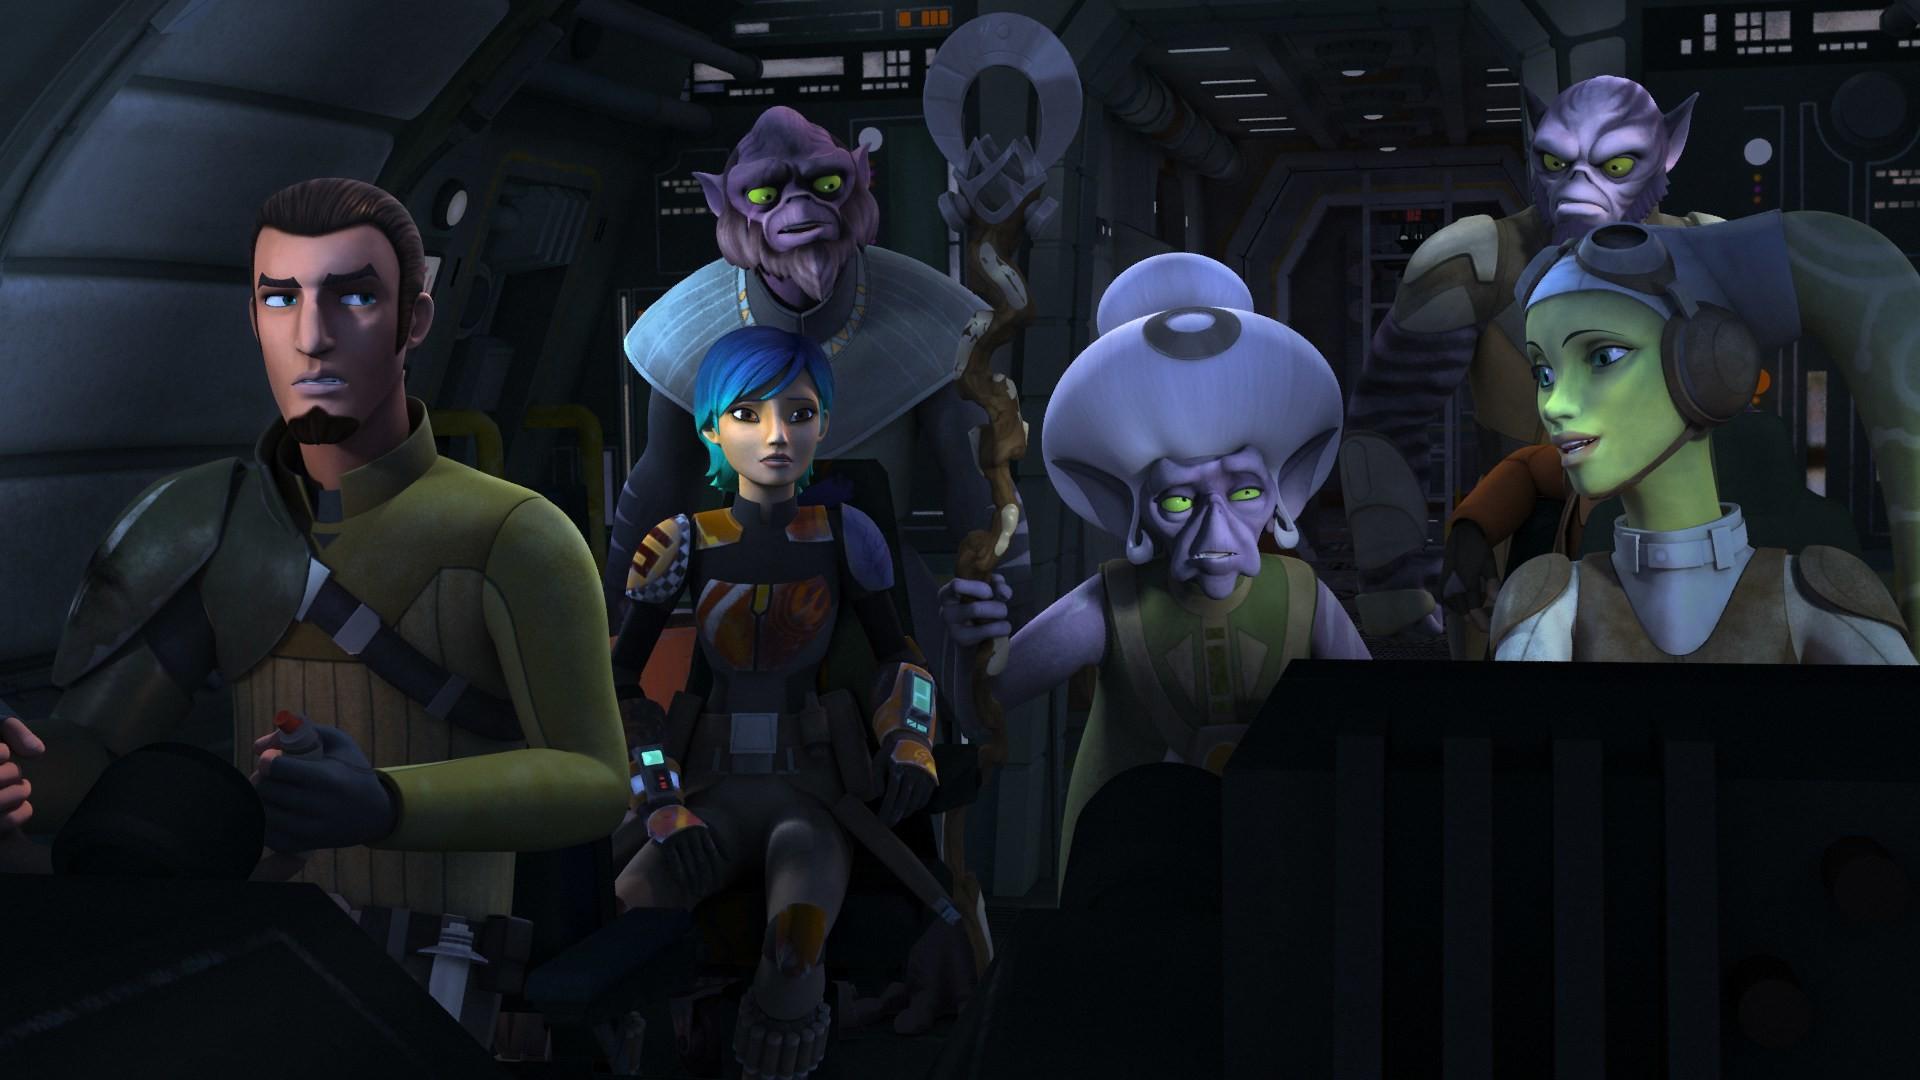 star wars rebels season 2 episode 4 download